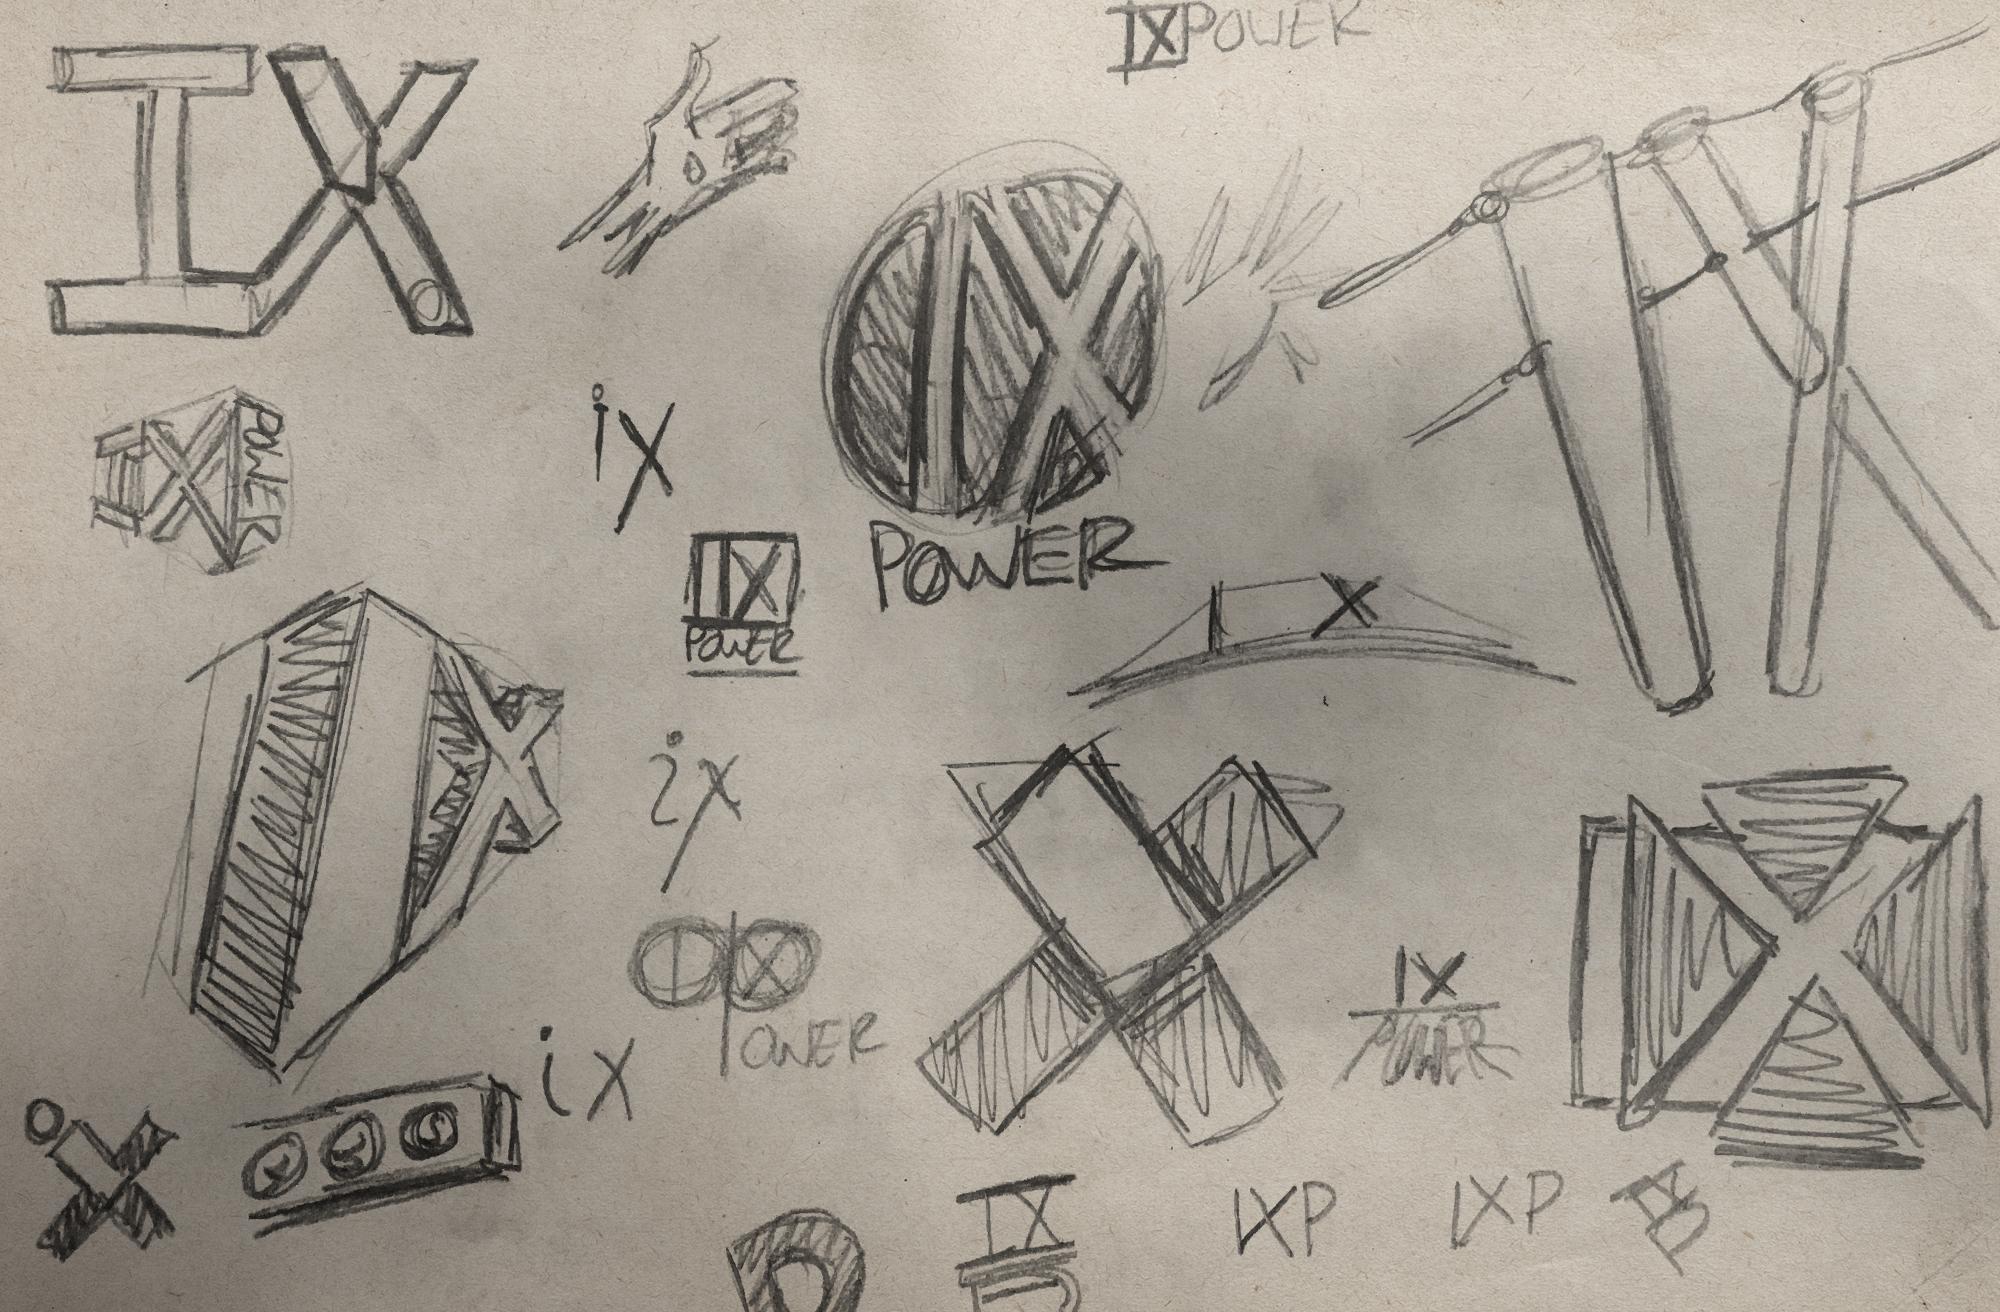 IX Power logo sketches